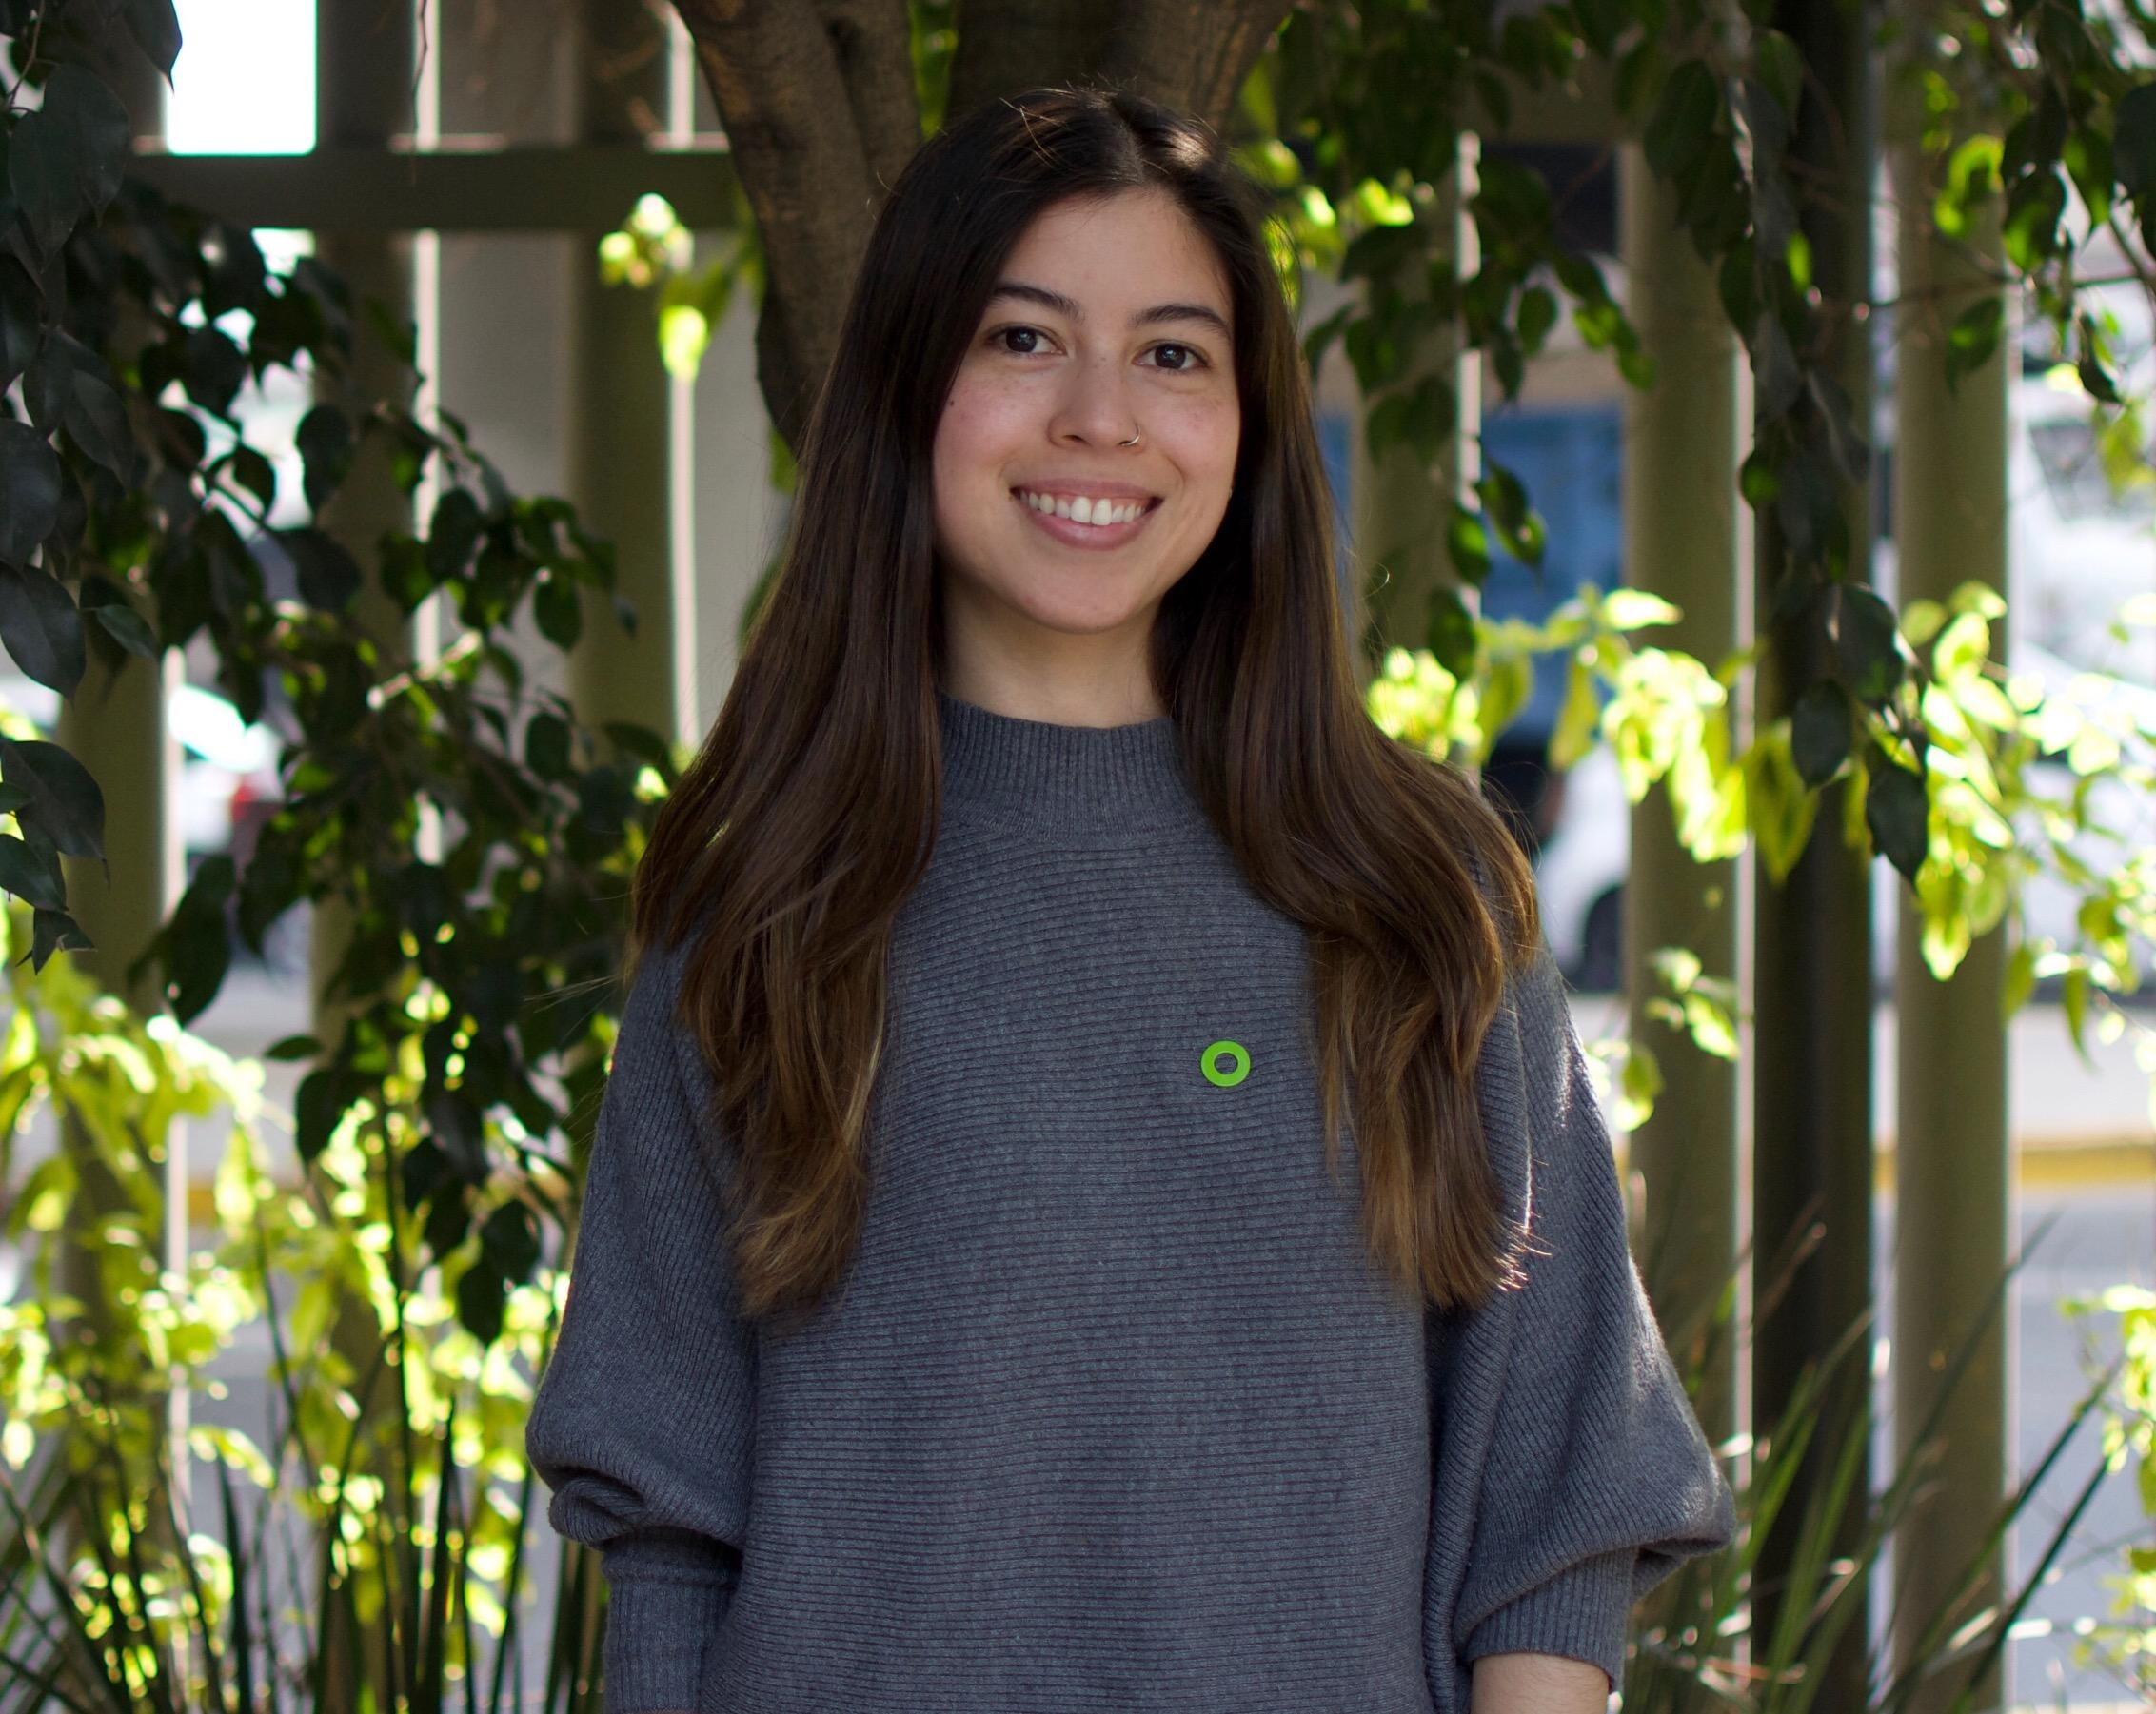 Ximena Perez